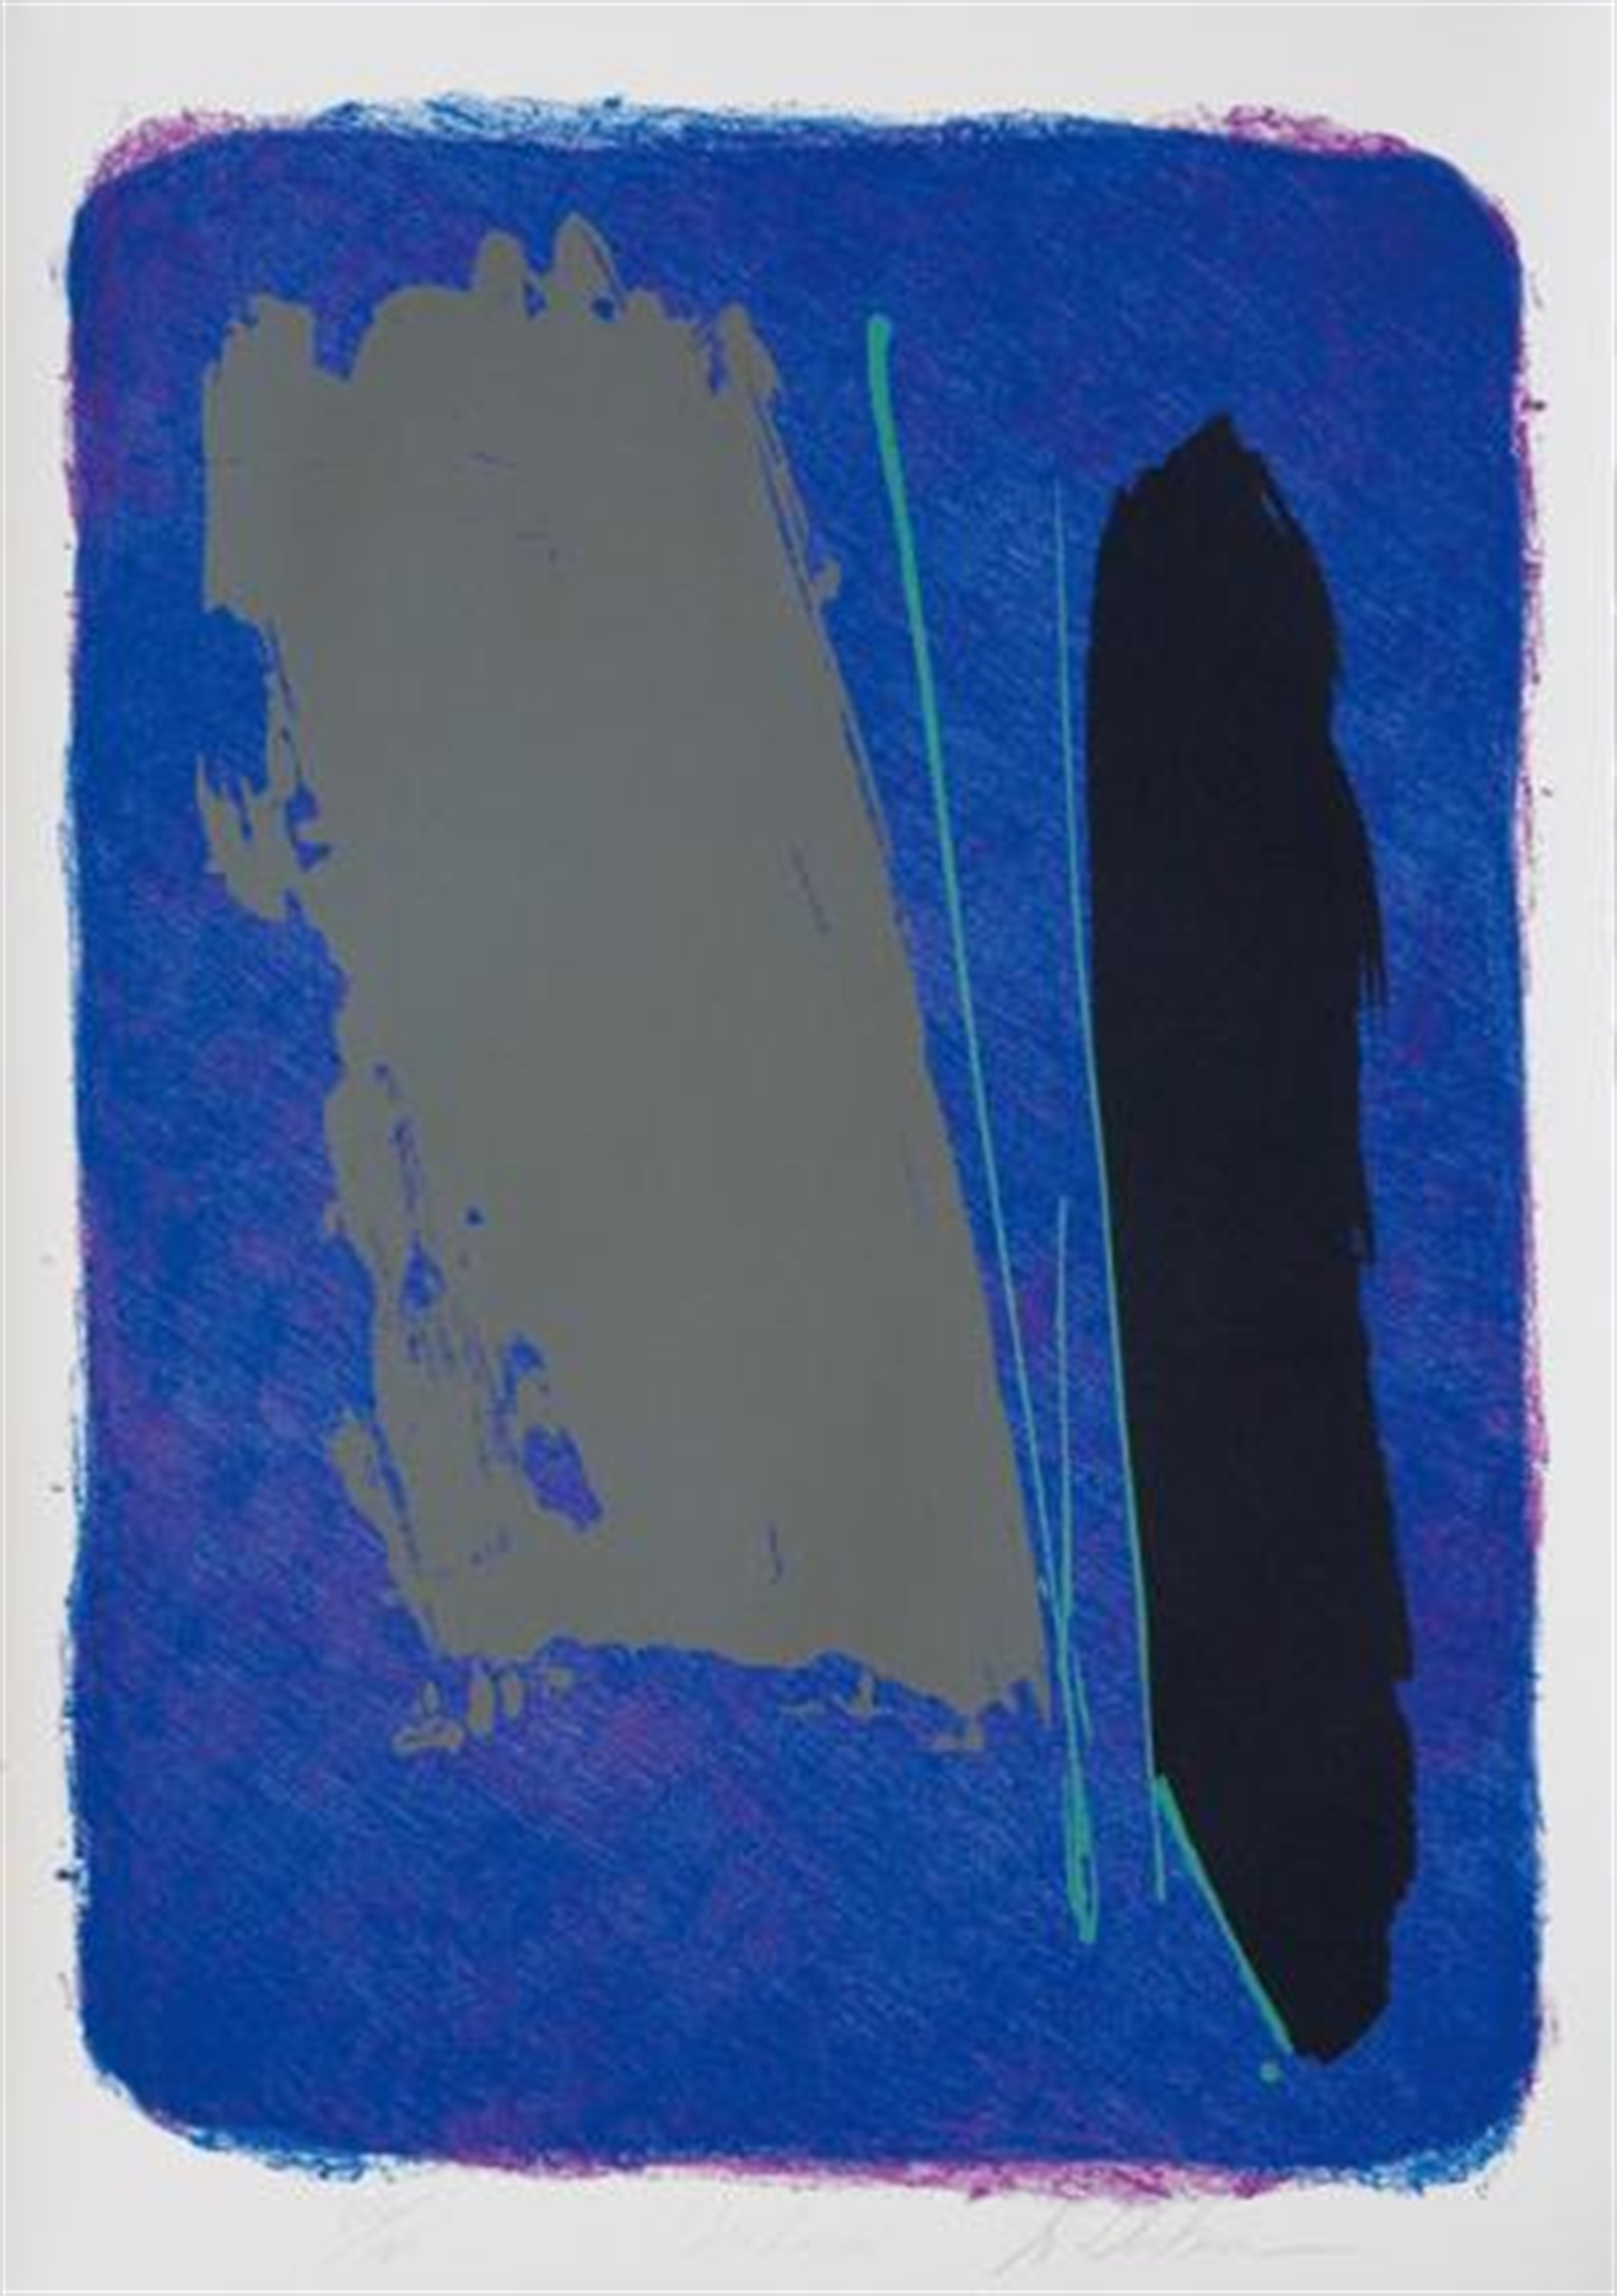 Blue Rancho by Dan Christensen